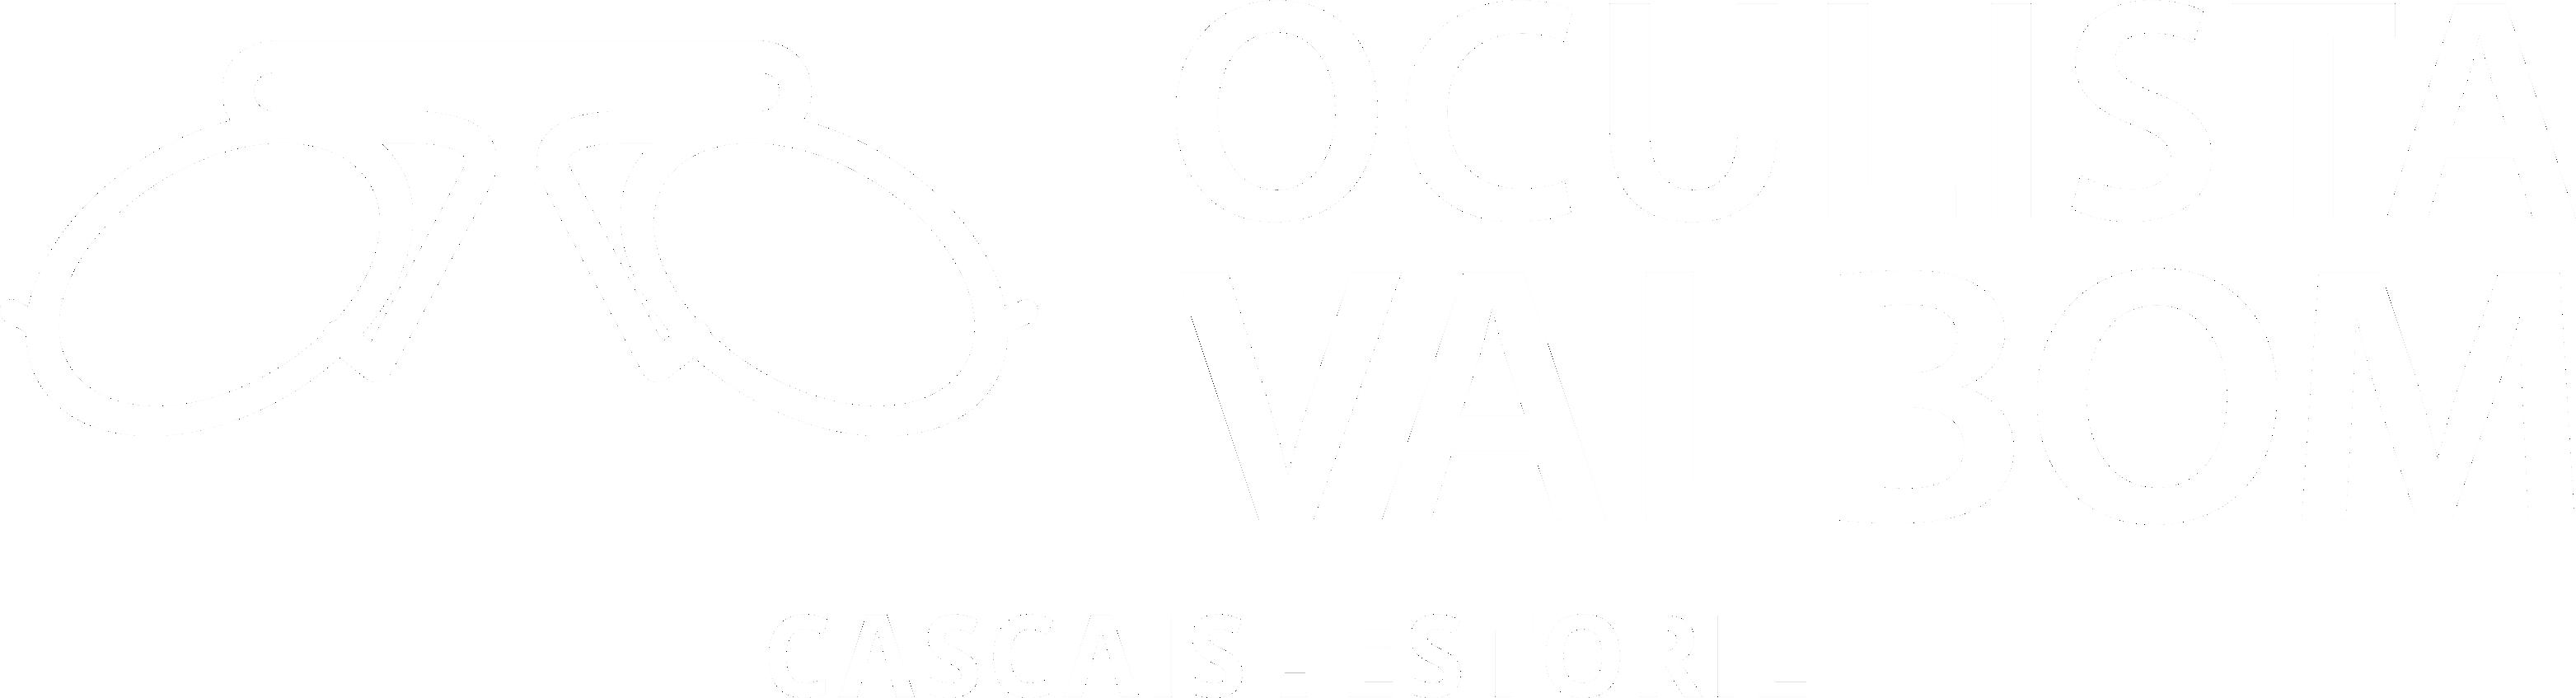 LogoValbom2019(Site_Rodapé)fundoTransp